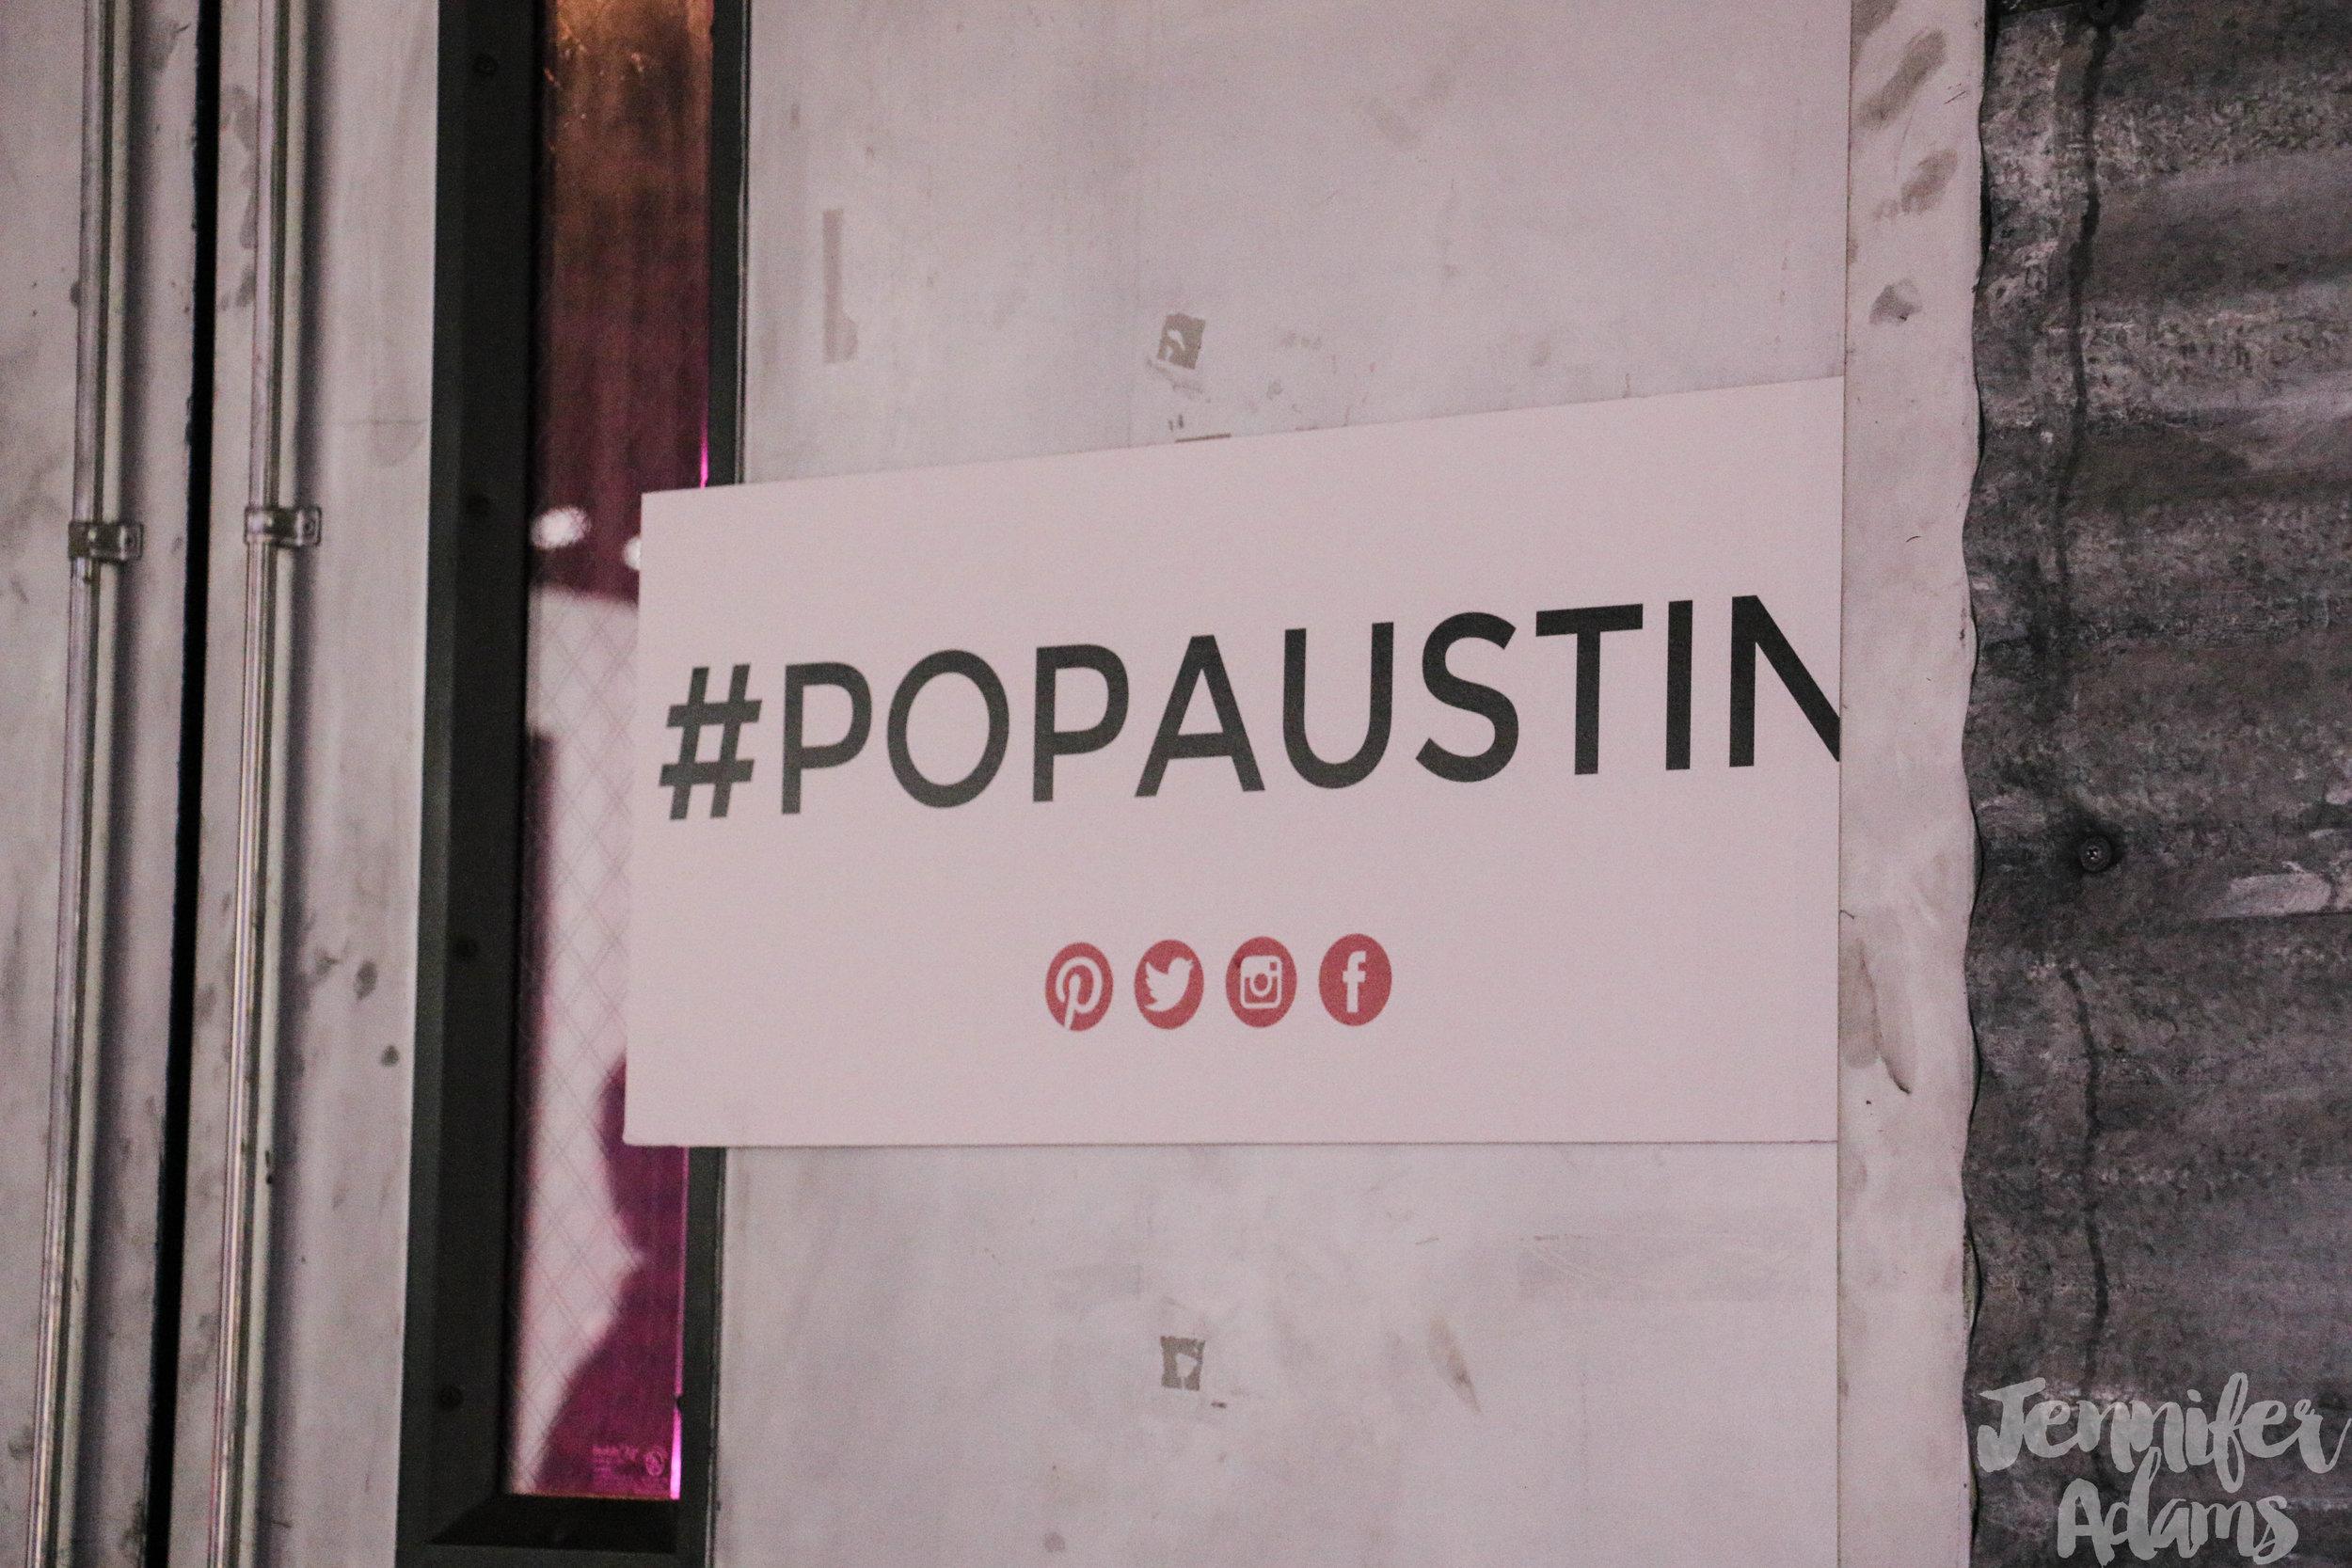 Pop-Austin-20.jpg